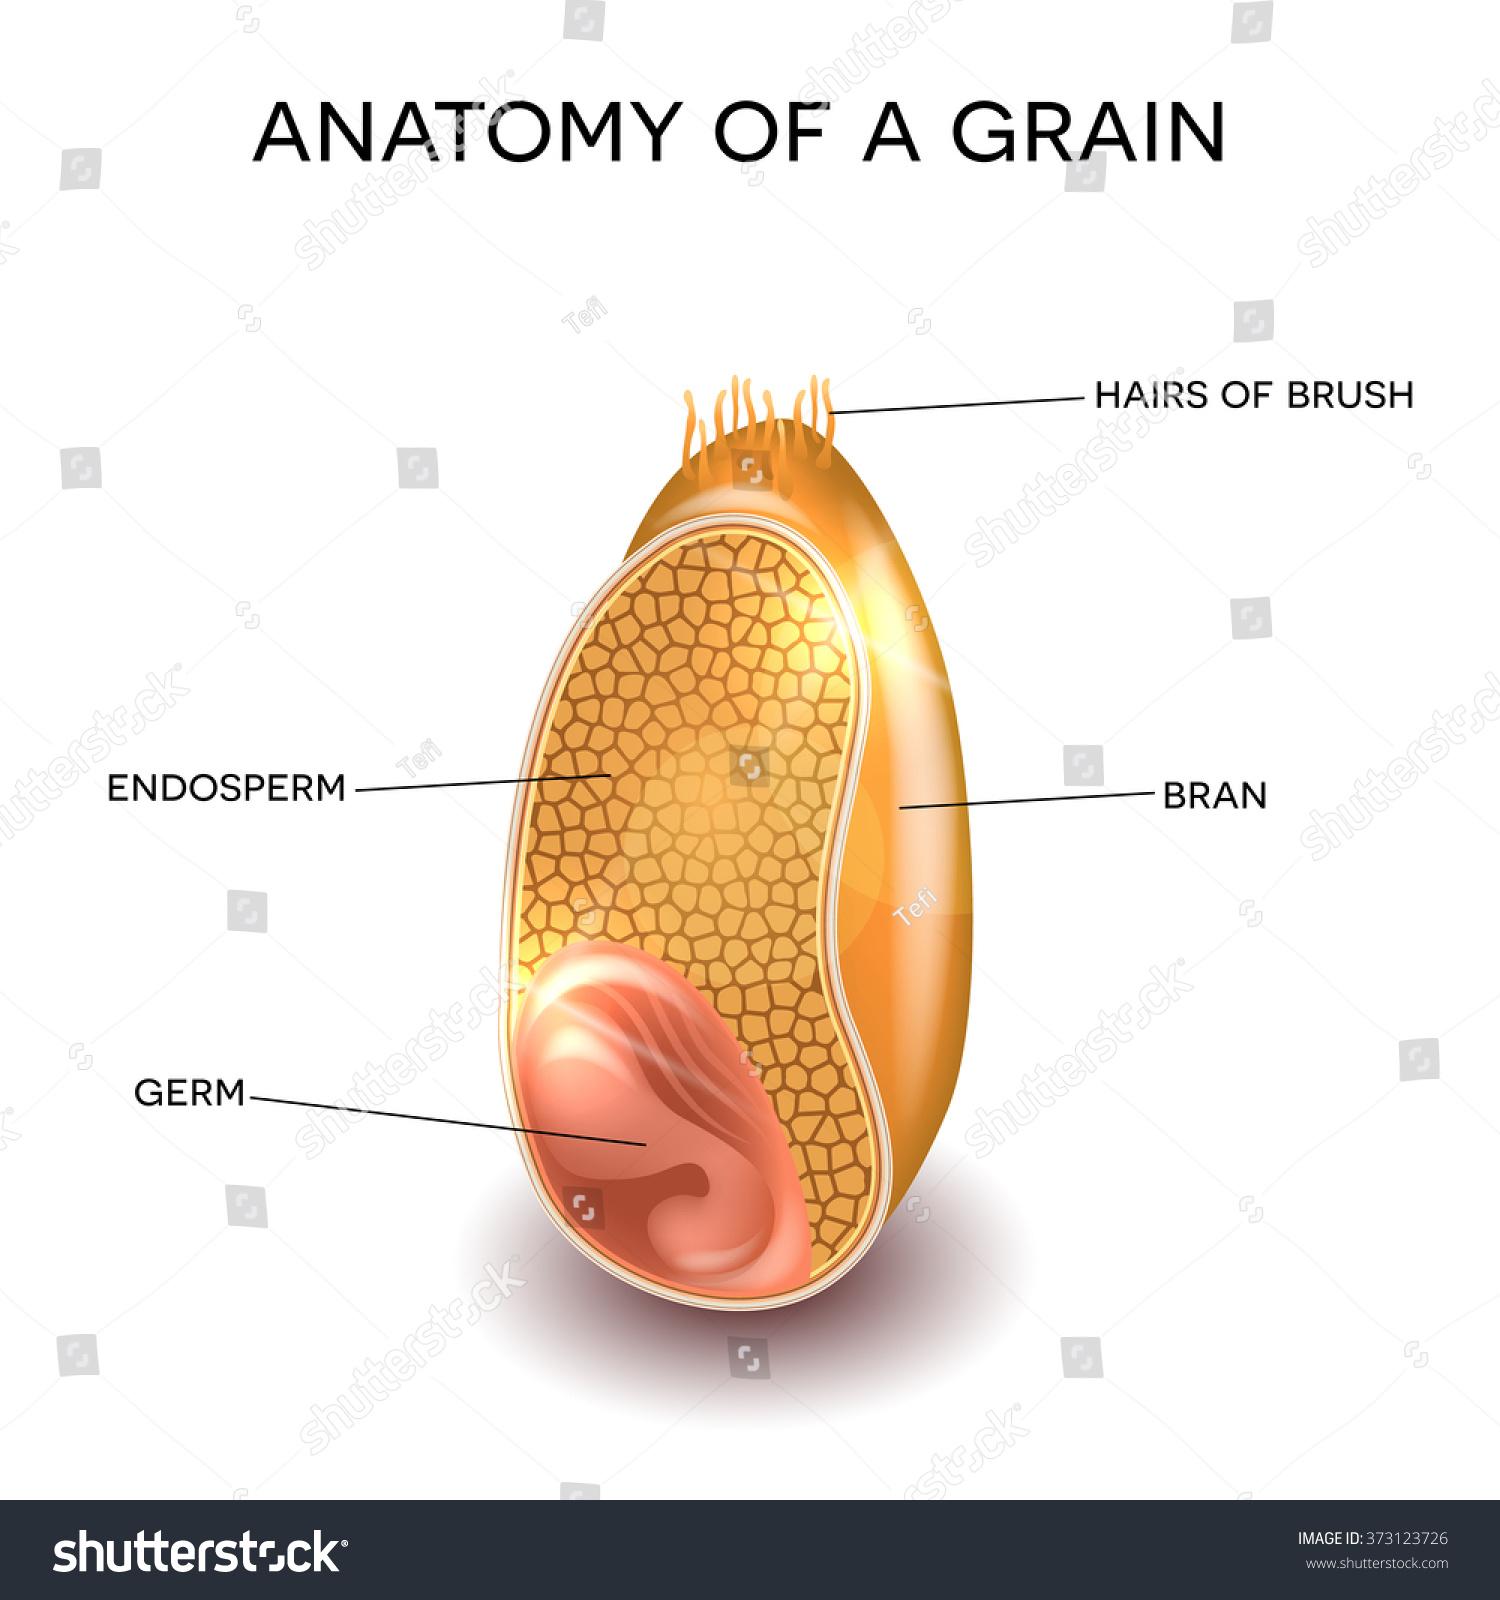 Grain Cross Section Anatomy Endosperm Germ Stock Illustration ...